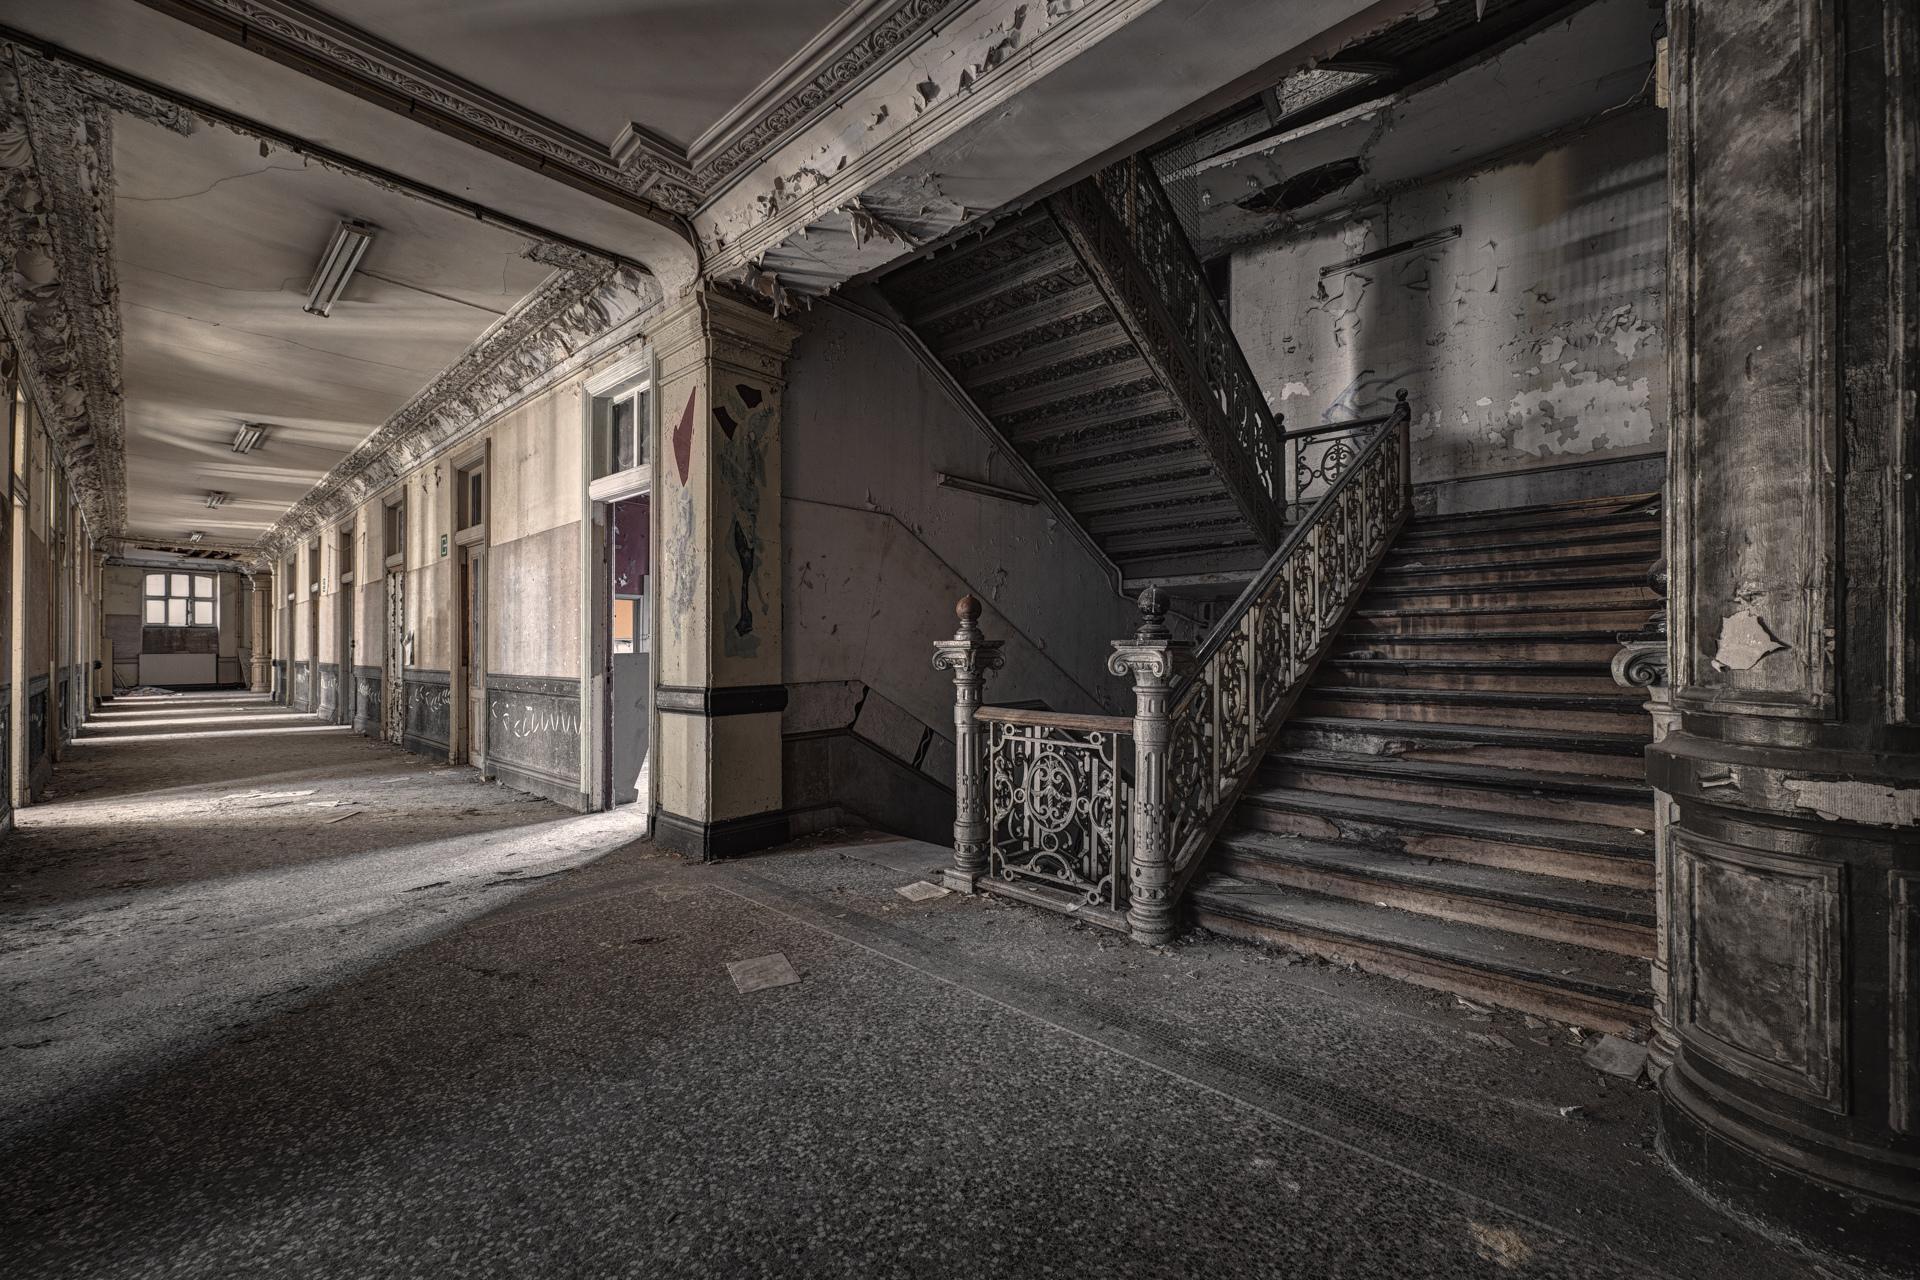 Urban Exploration - Pritzer Fac - Pritzker Staircase